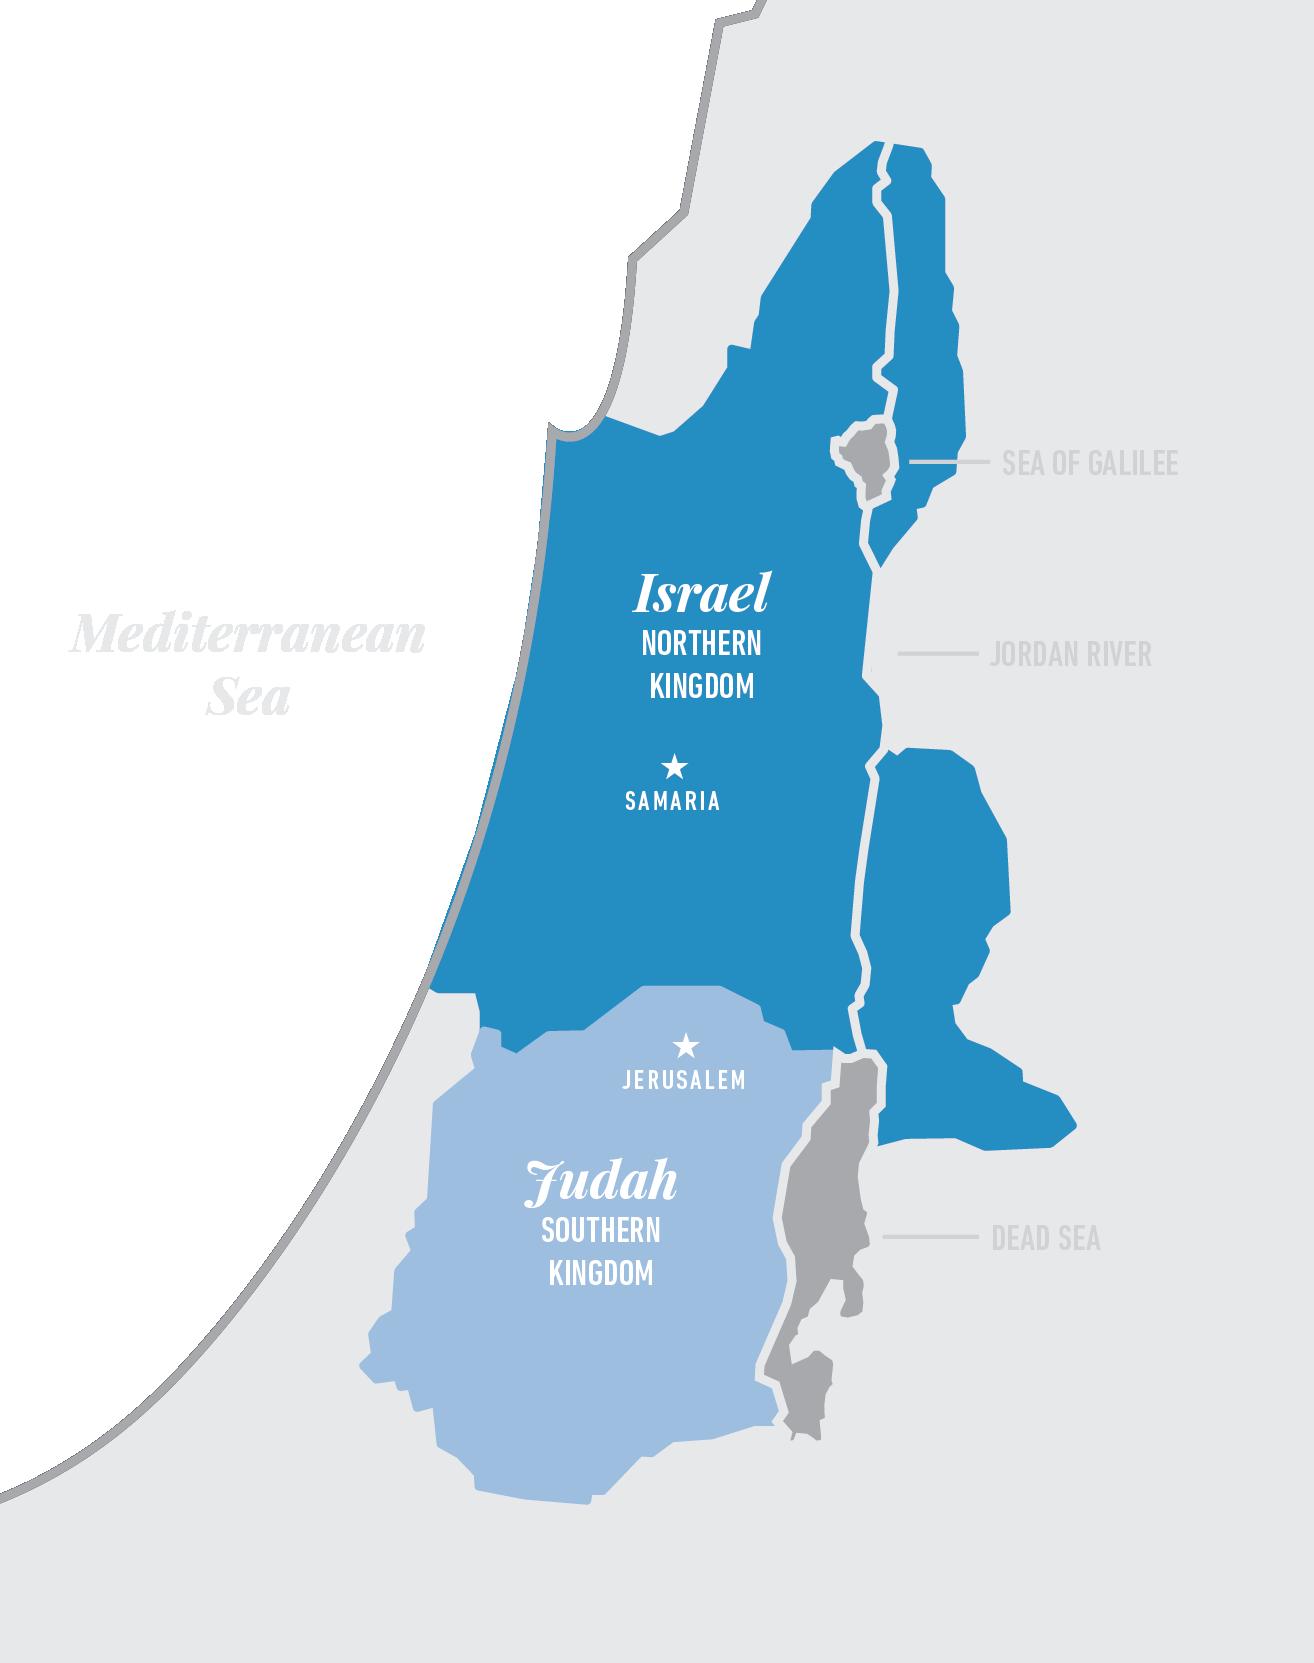 Ten tribes make up the northern kingdom of Israel: Asher, Dan, Ephraim, Gad, Issachar, Manesseh, Naphtali, Reuben, Simeon, Zebulun. Two tribes make up the southern kingdom of Judah: Judah and Benjamin.